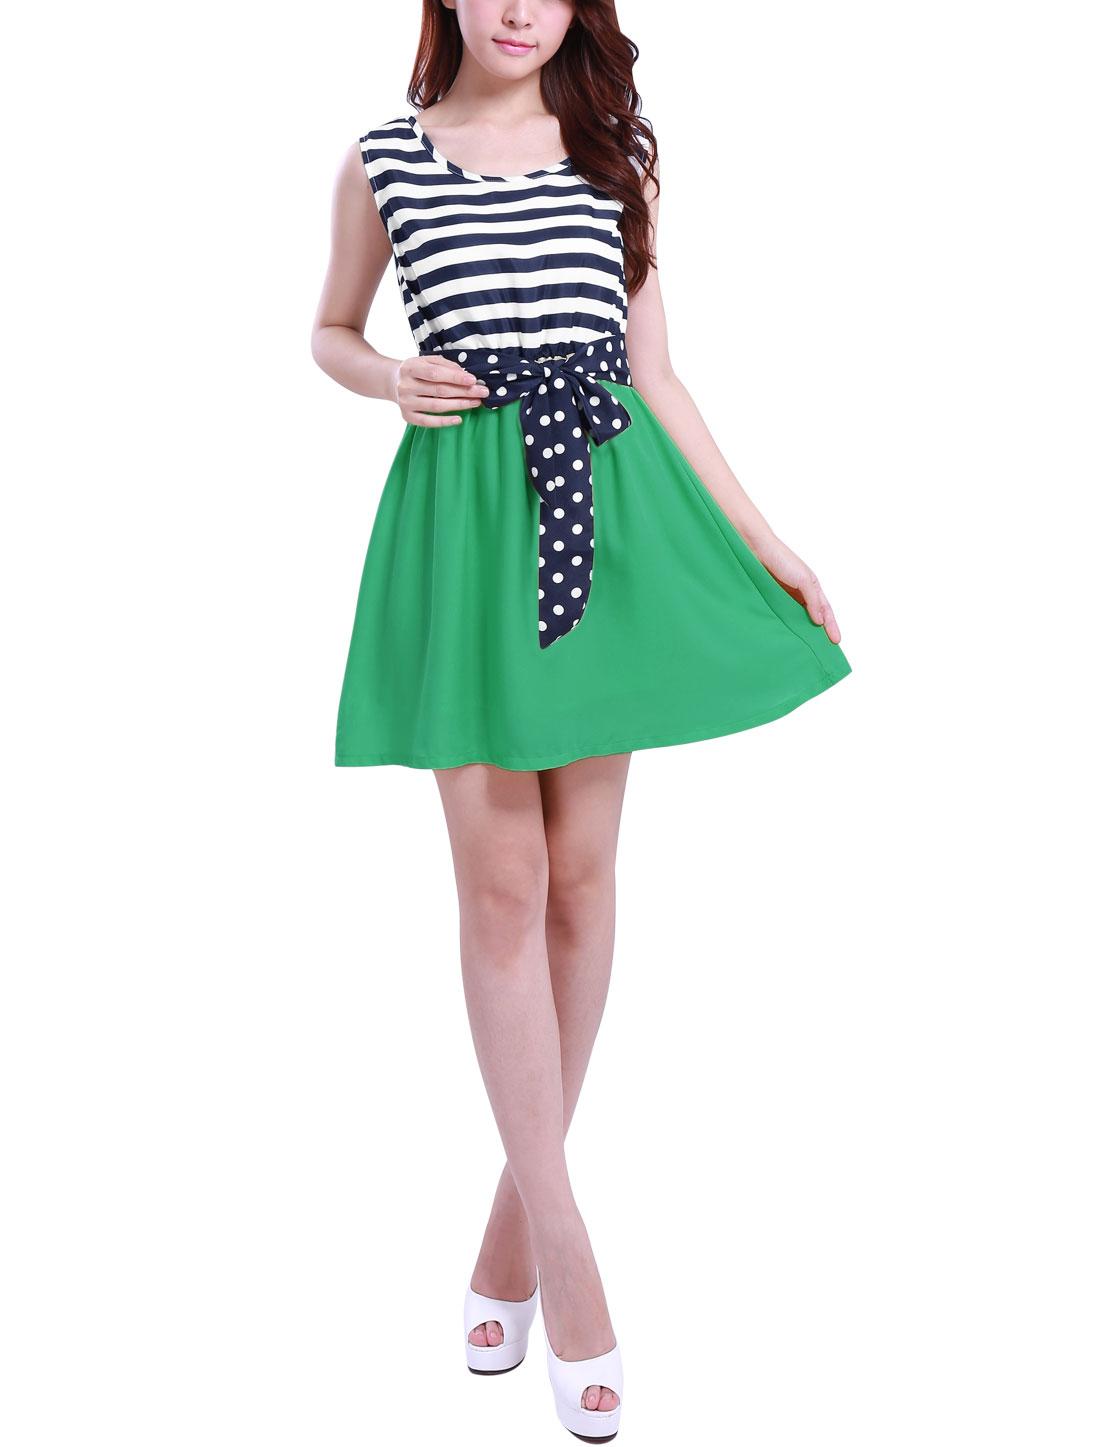 Ladies Sleeveless Stripe Printed Bid Pullover Green Dark Blue Tank Dress S